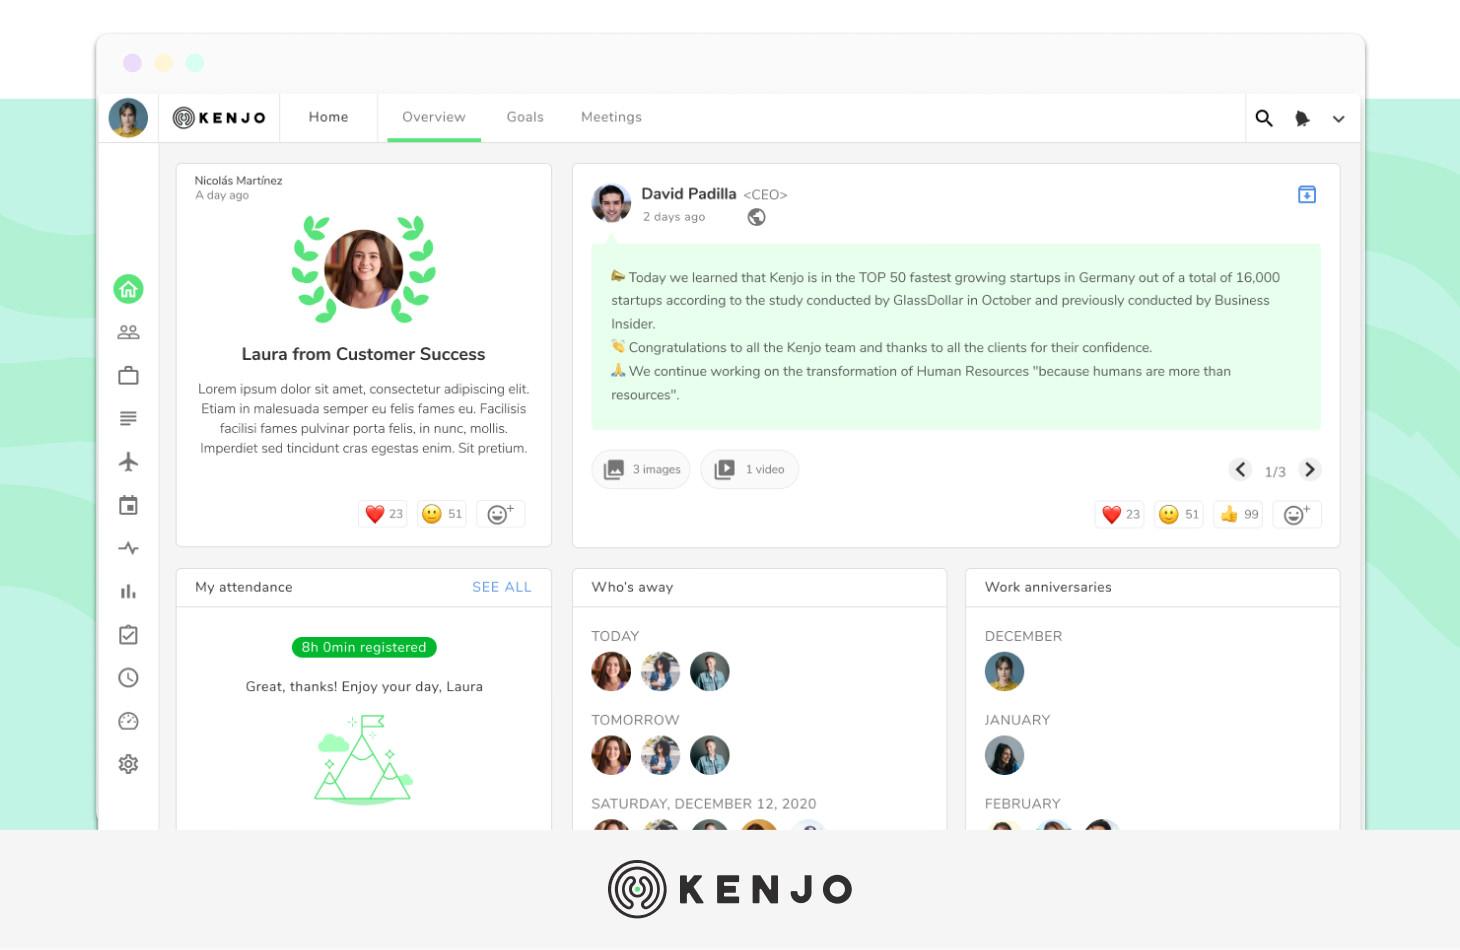 interface del software de clima laboral de Kenjo